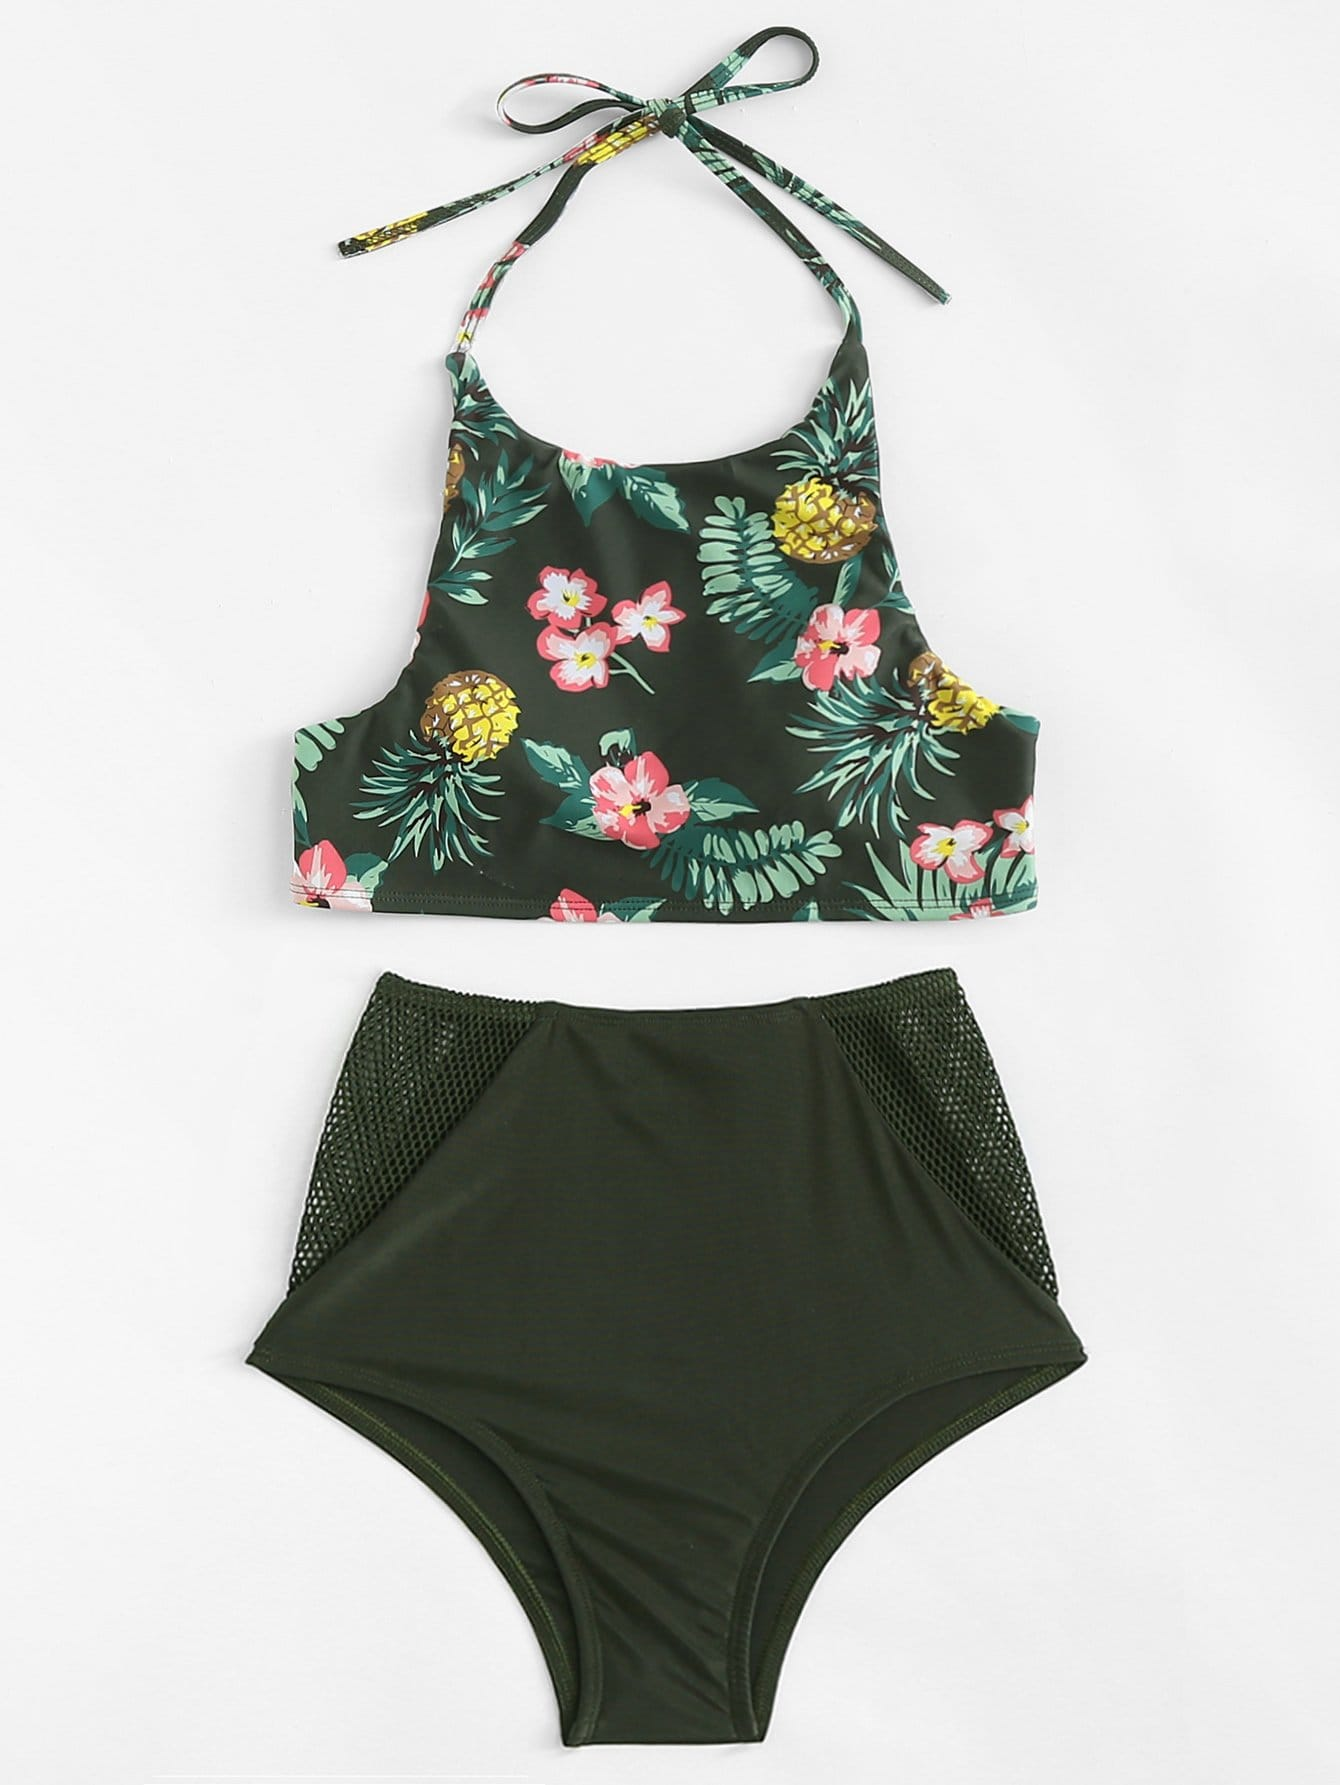 Tropical Print Cut Out Back Mesh Insert Bikini Set tropical print cross back bikini set